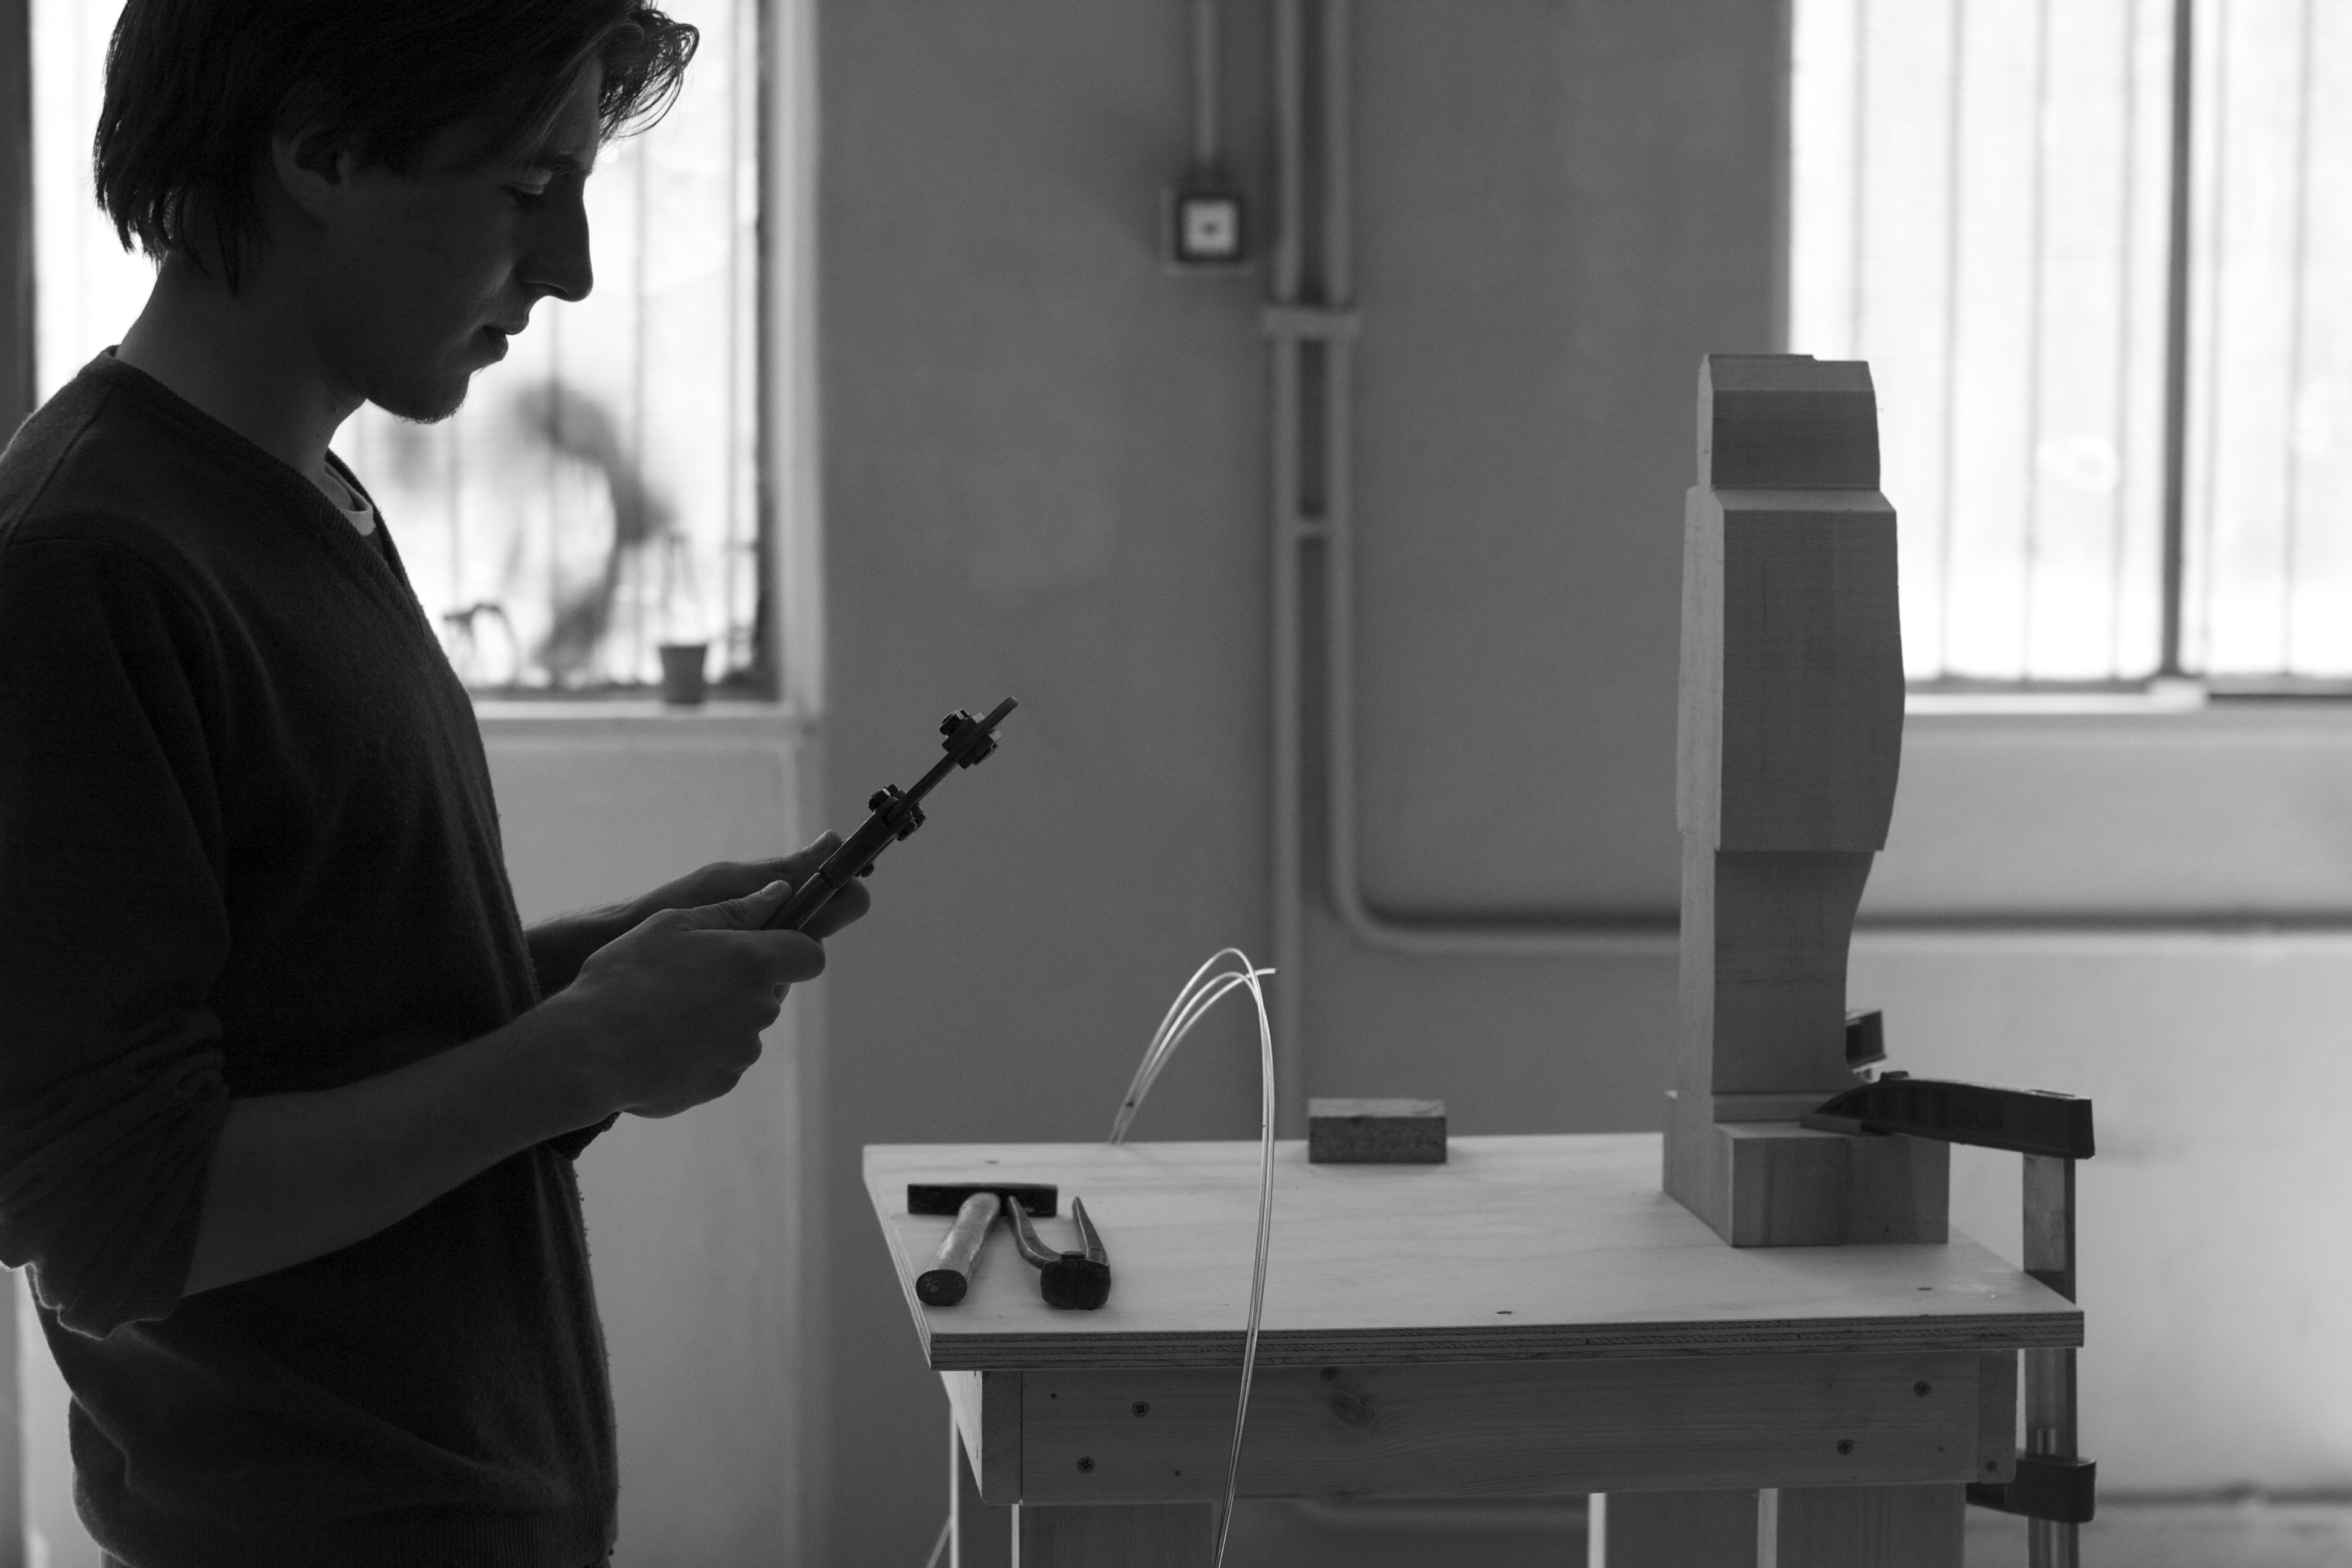 Flickr - Aron Demetz - Dialoghi e materia - Workshop a cura di Franco Reina19